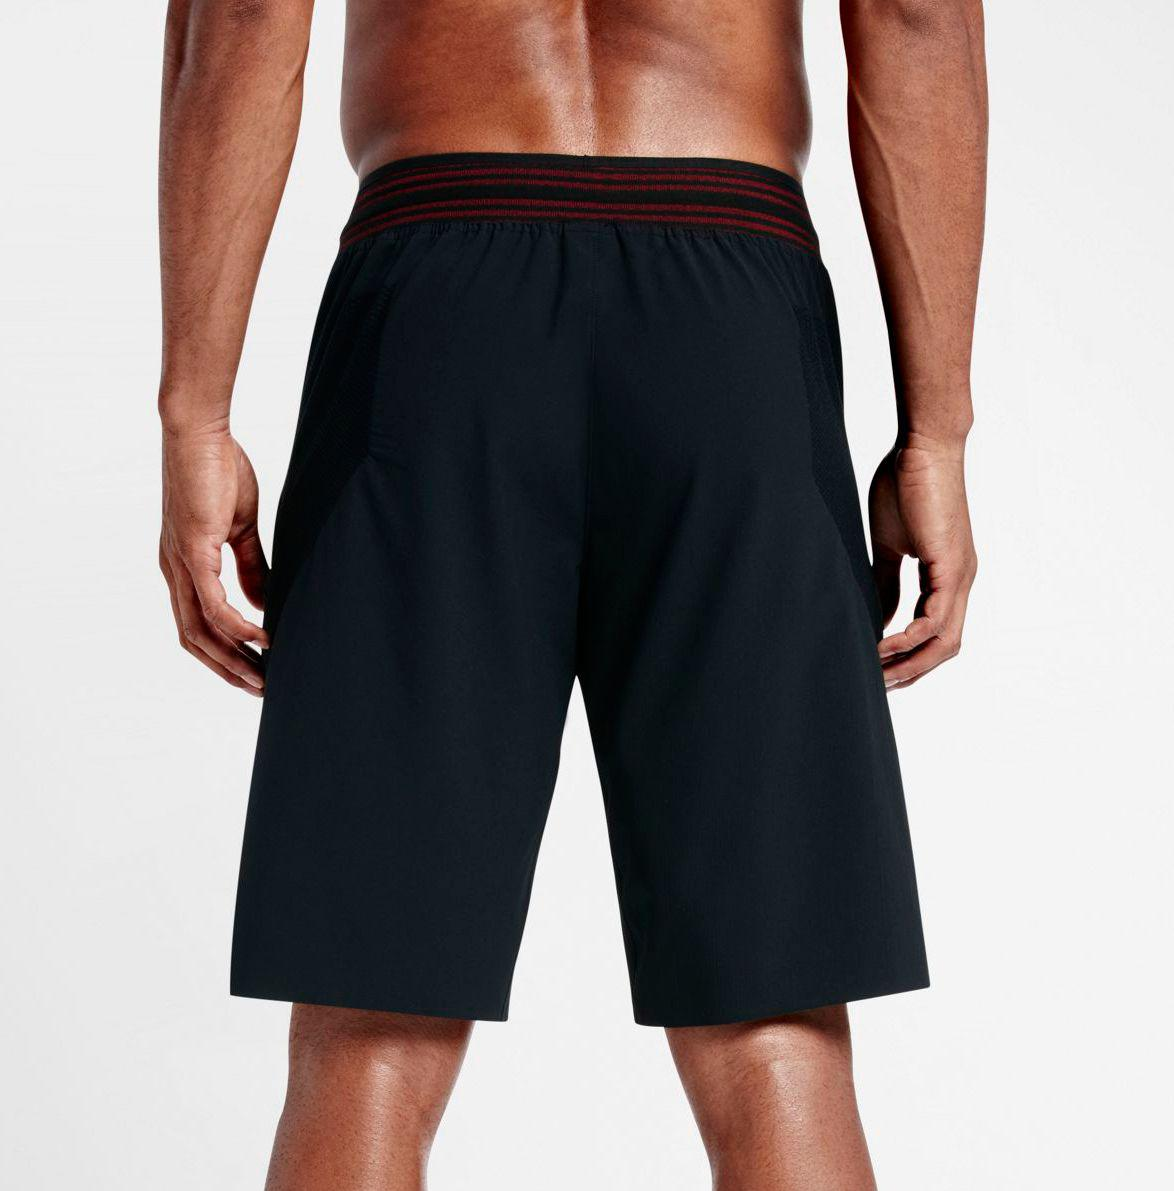 758fca547ad2 Lyst - Nike 23 Tech Flex Hyperweave Basketball Shorts in Black for Men